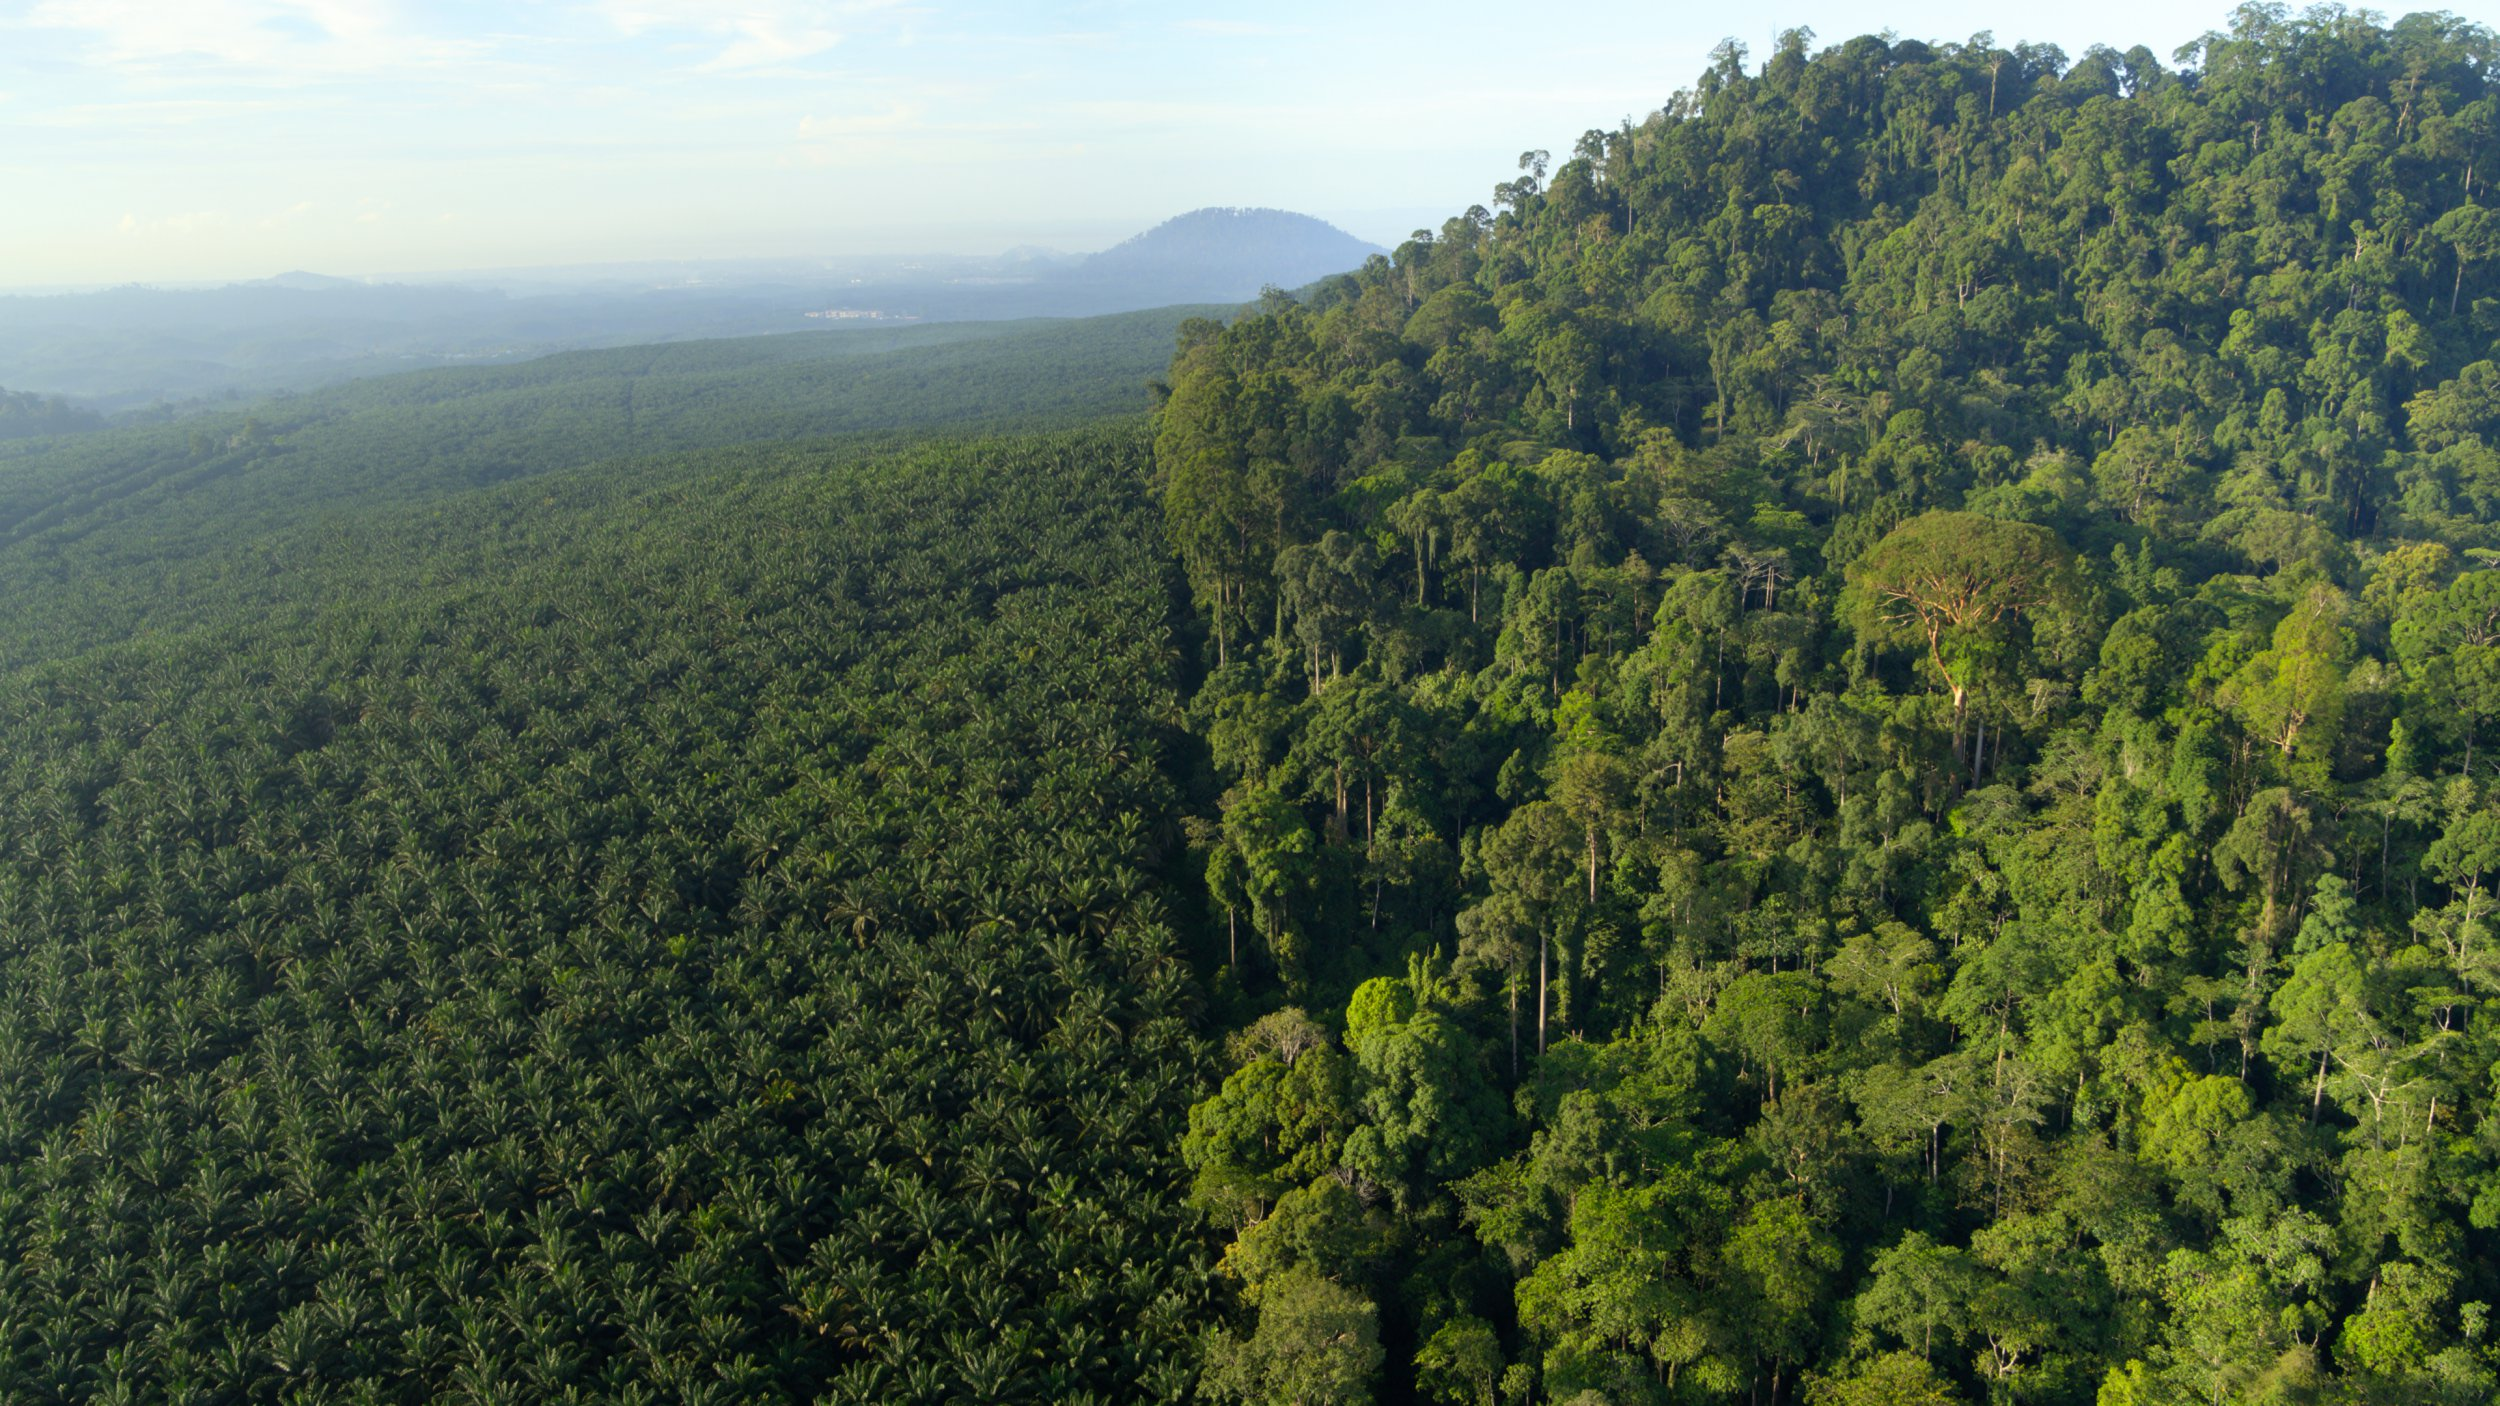 Jelenet David Attenborough A Life on Our Planet c. filmjéből